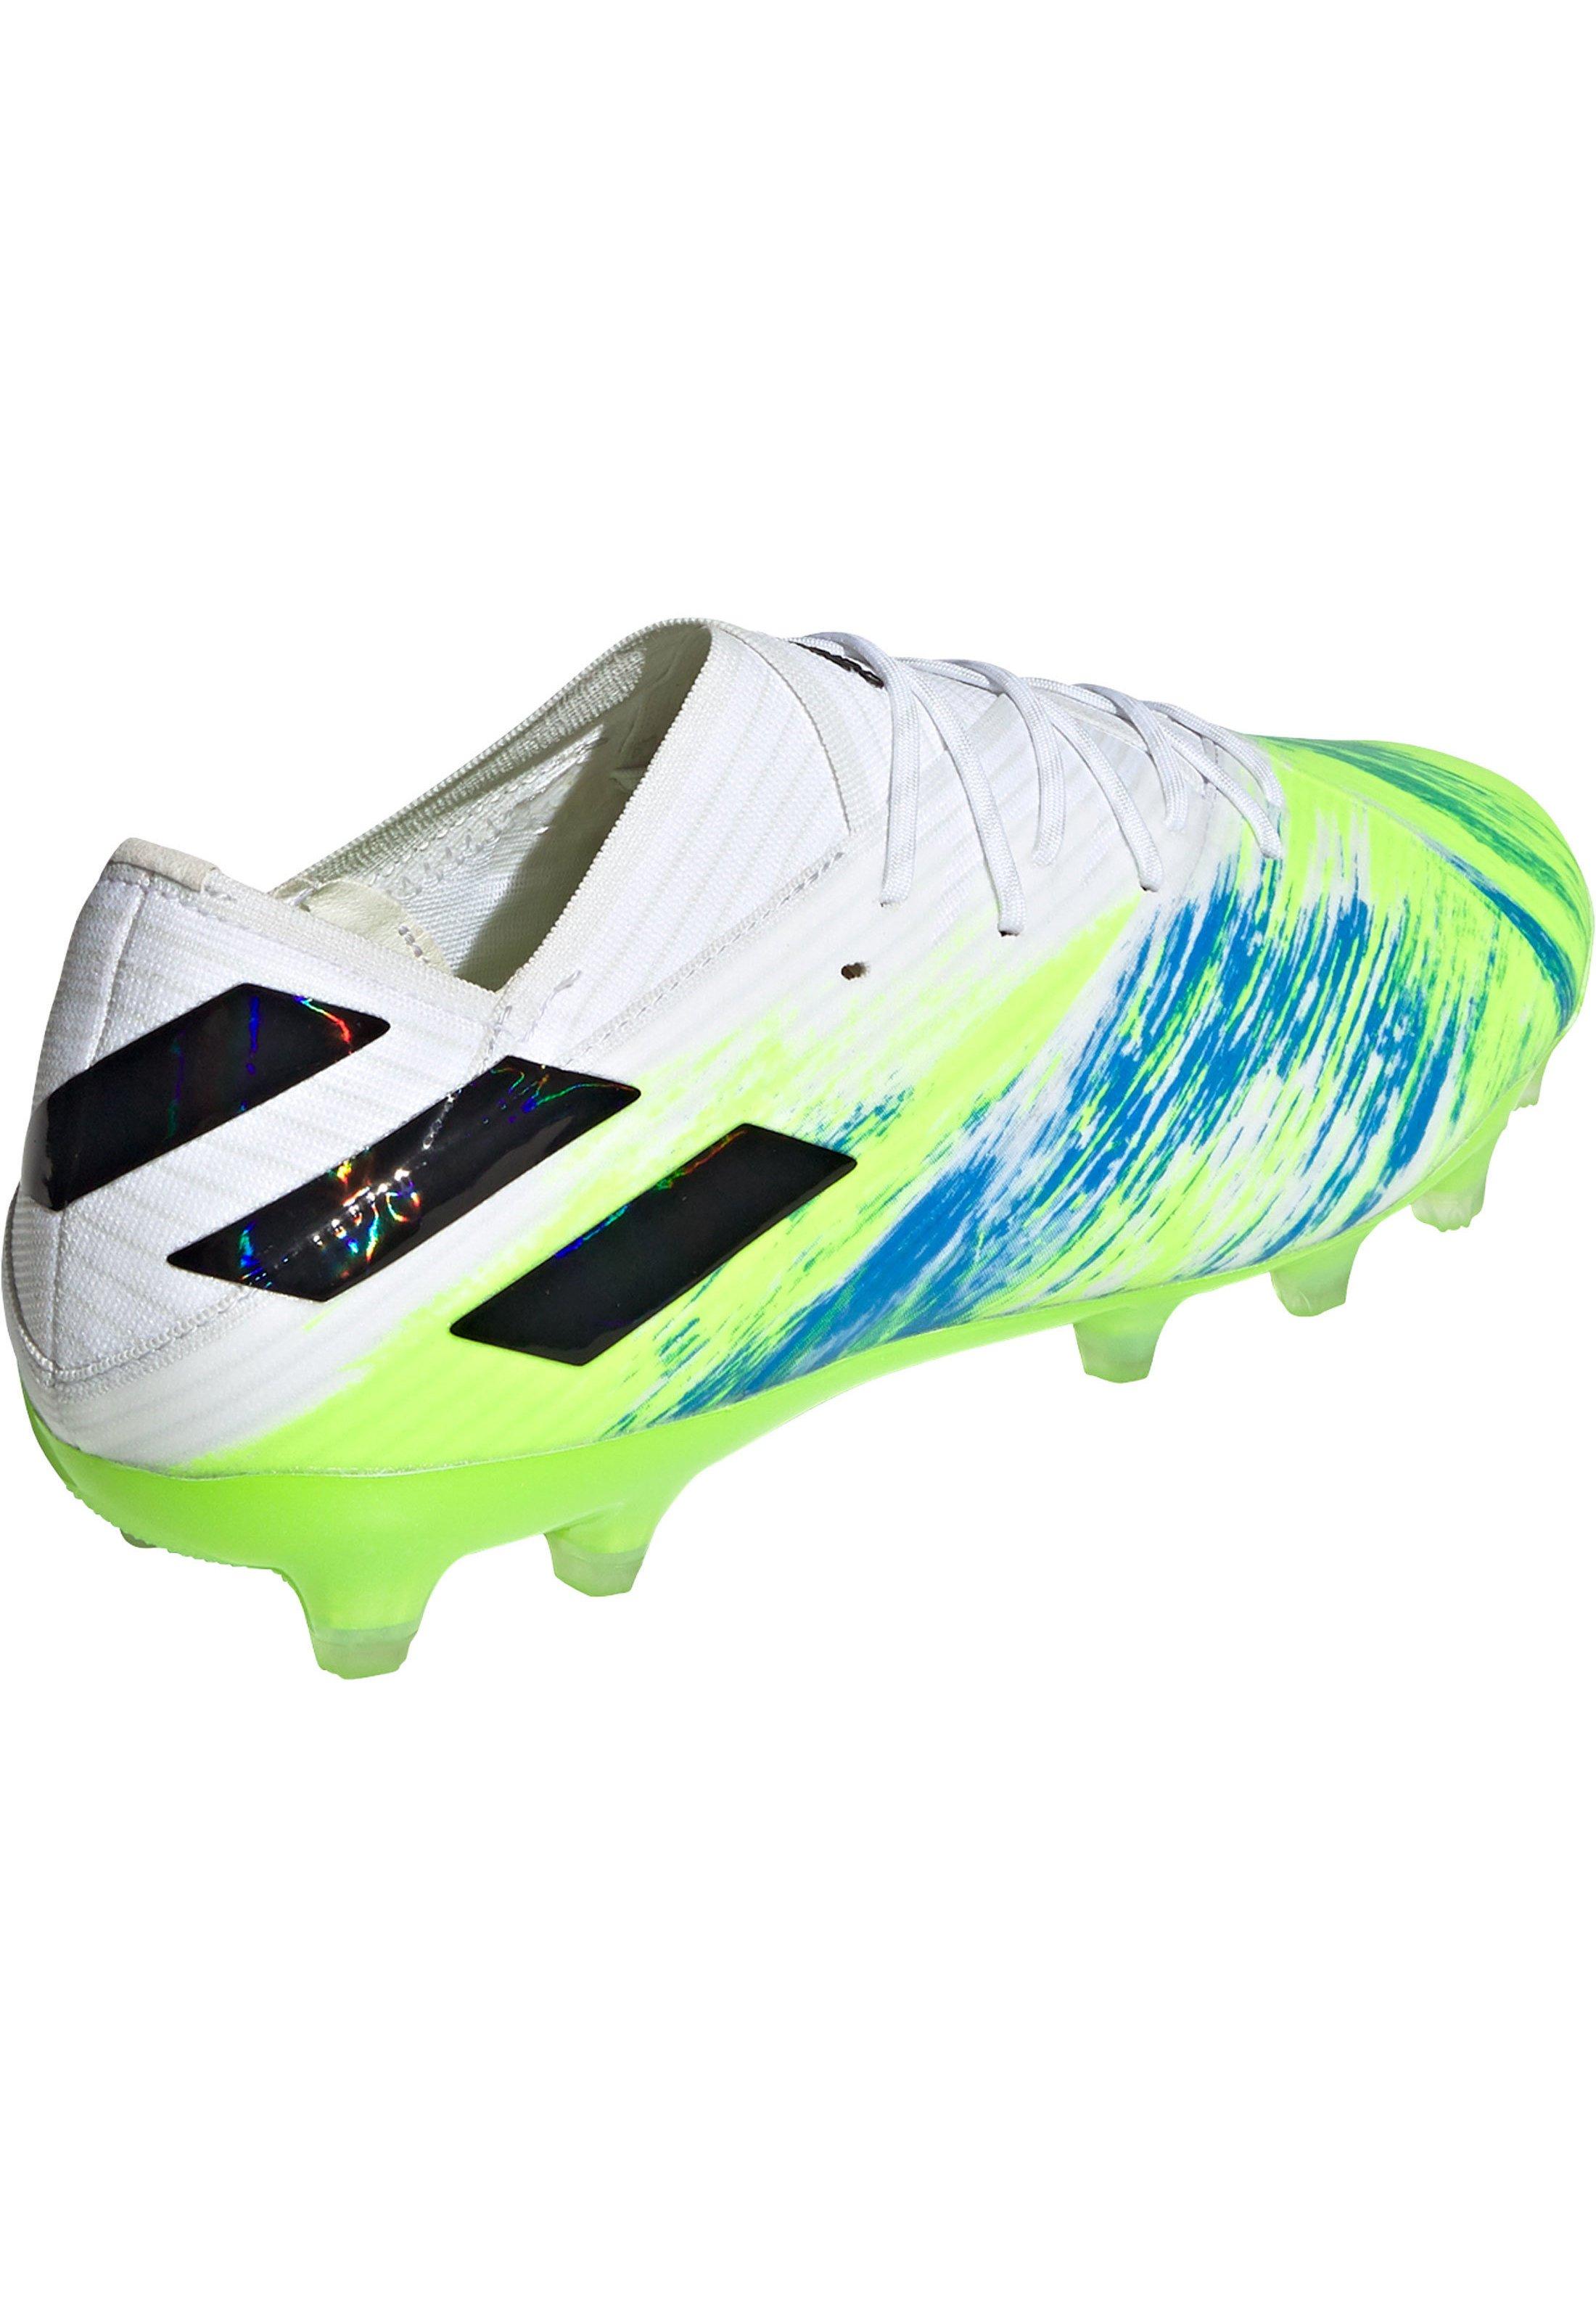 adidas Performance NEMEZIZ 19.1 AG  - Fußballschuh Nocken - footwear white / core black / signal green/weiß - Herrenschuhe sk5us